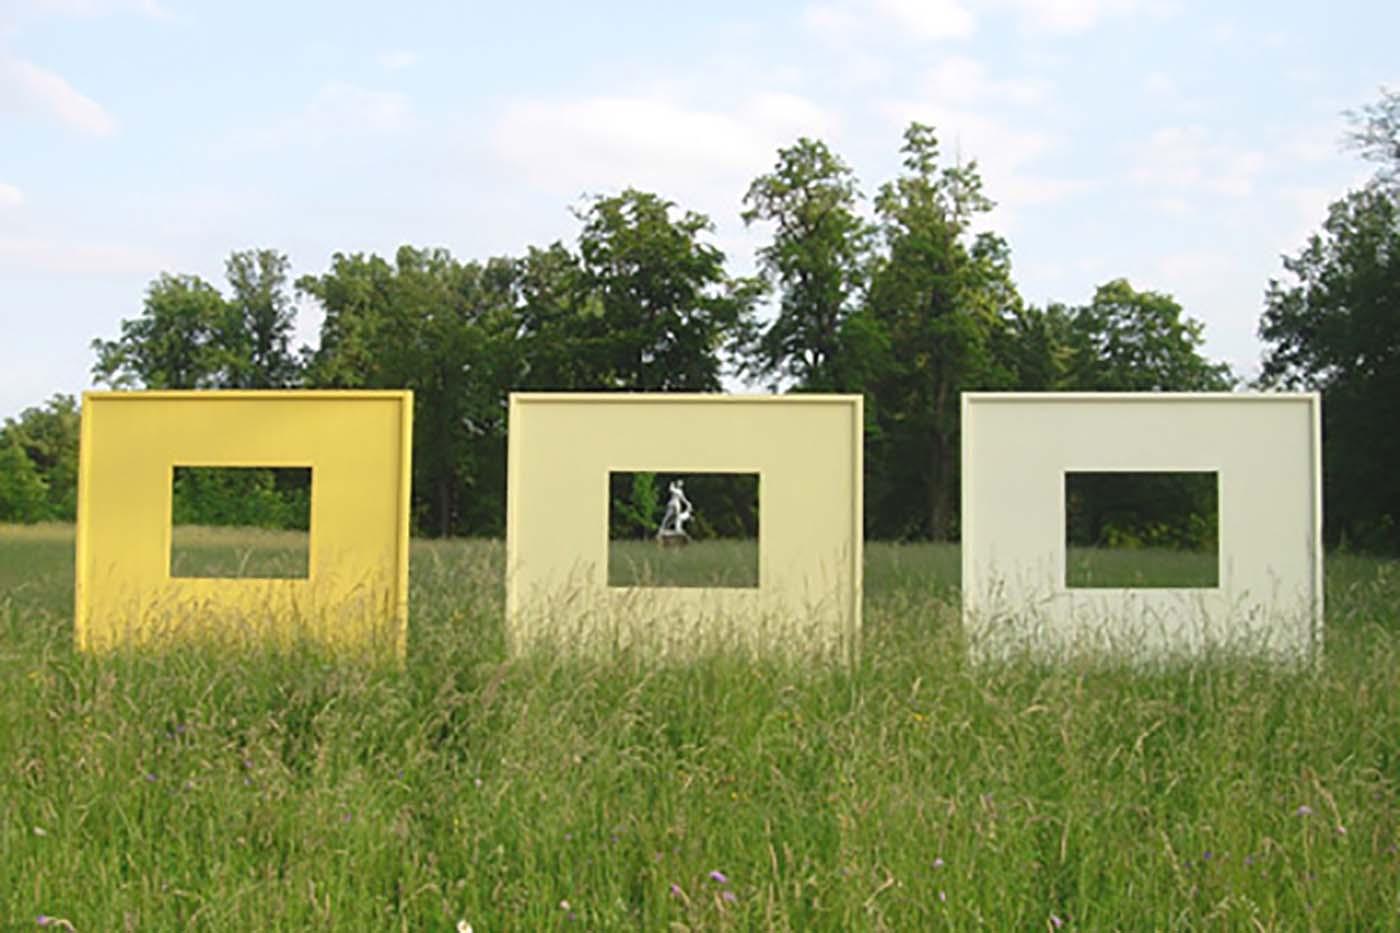 12_Ansichten gelb, Schloss Fasanerie [2007]